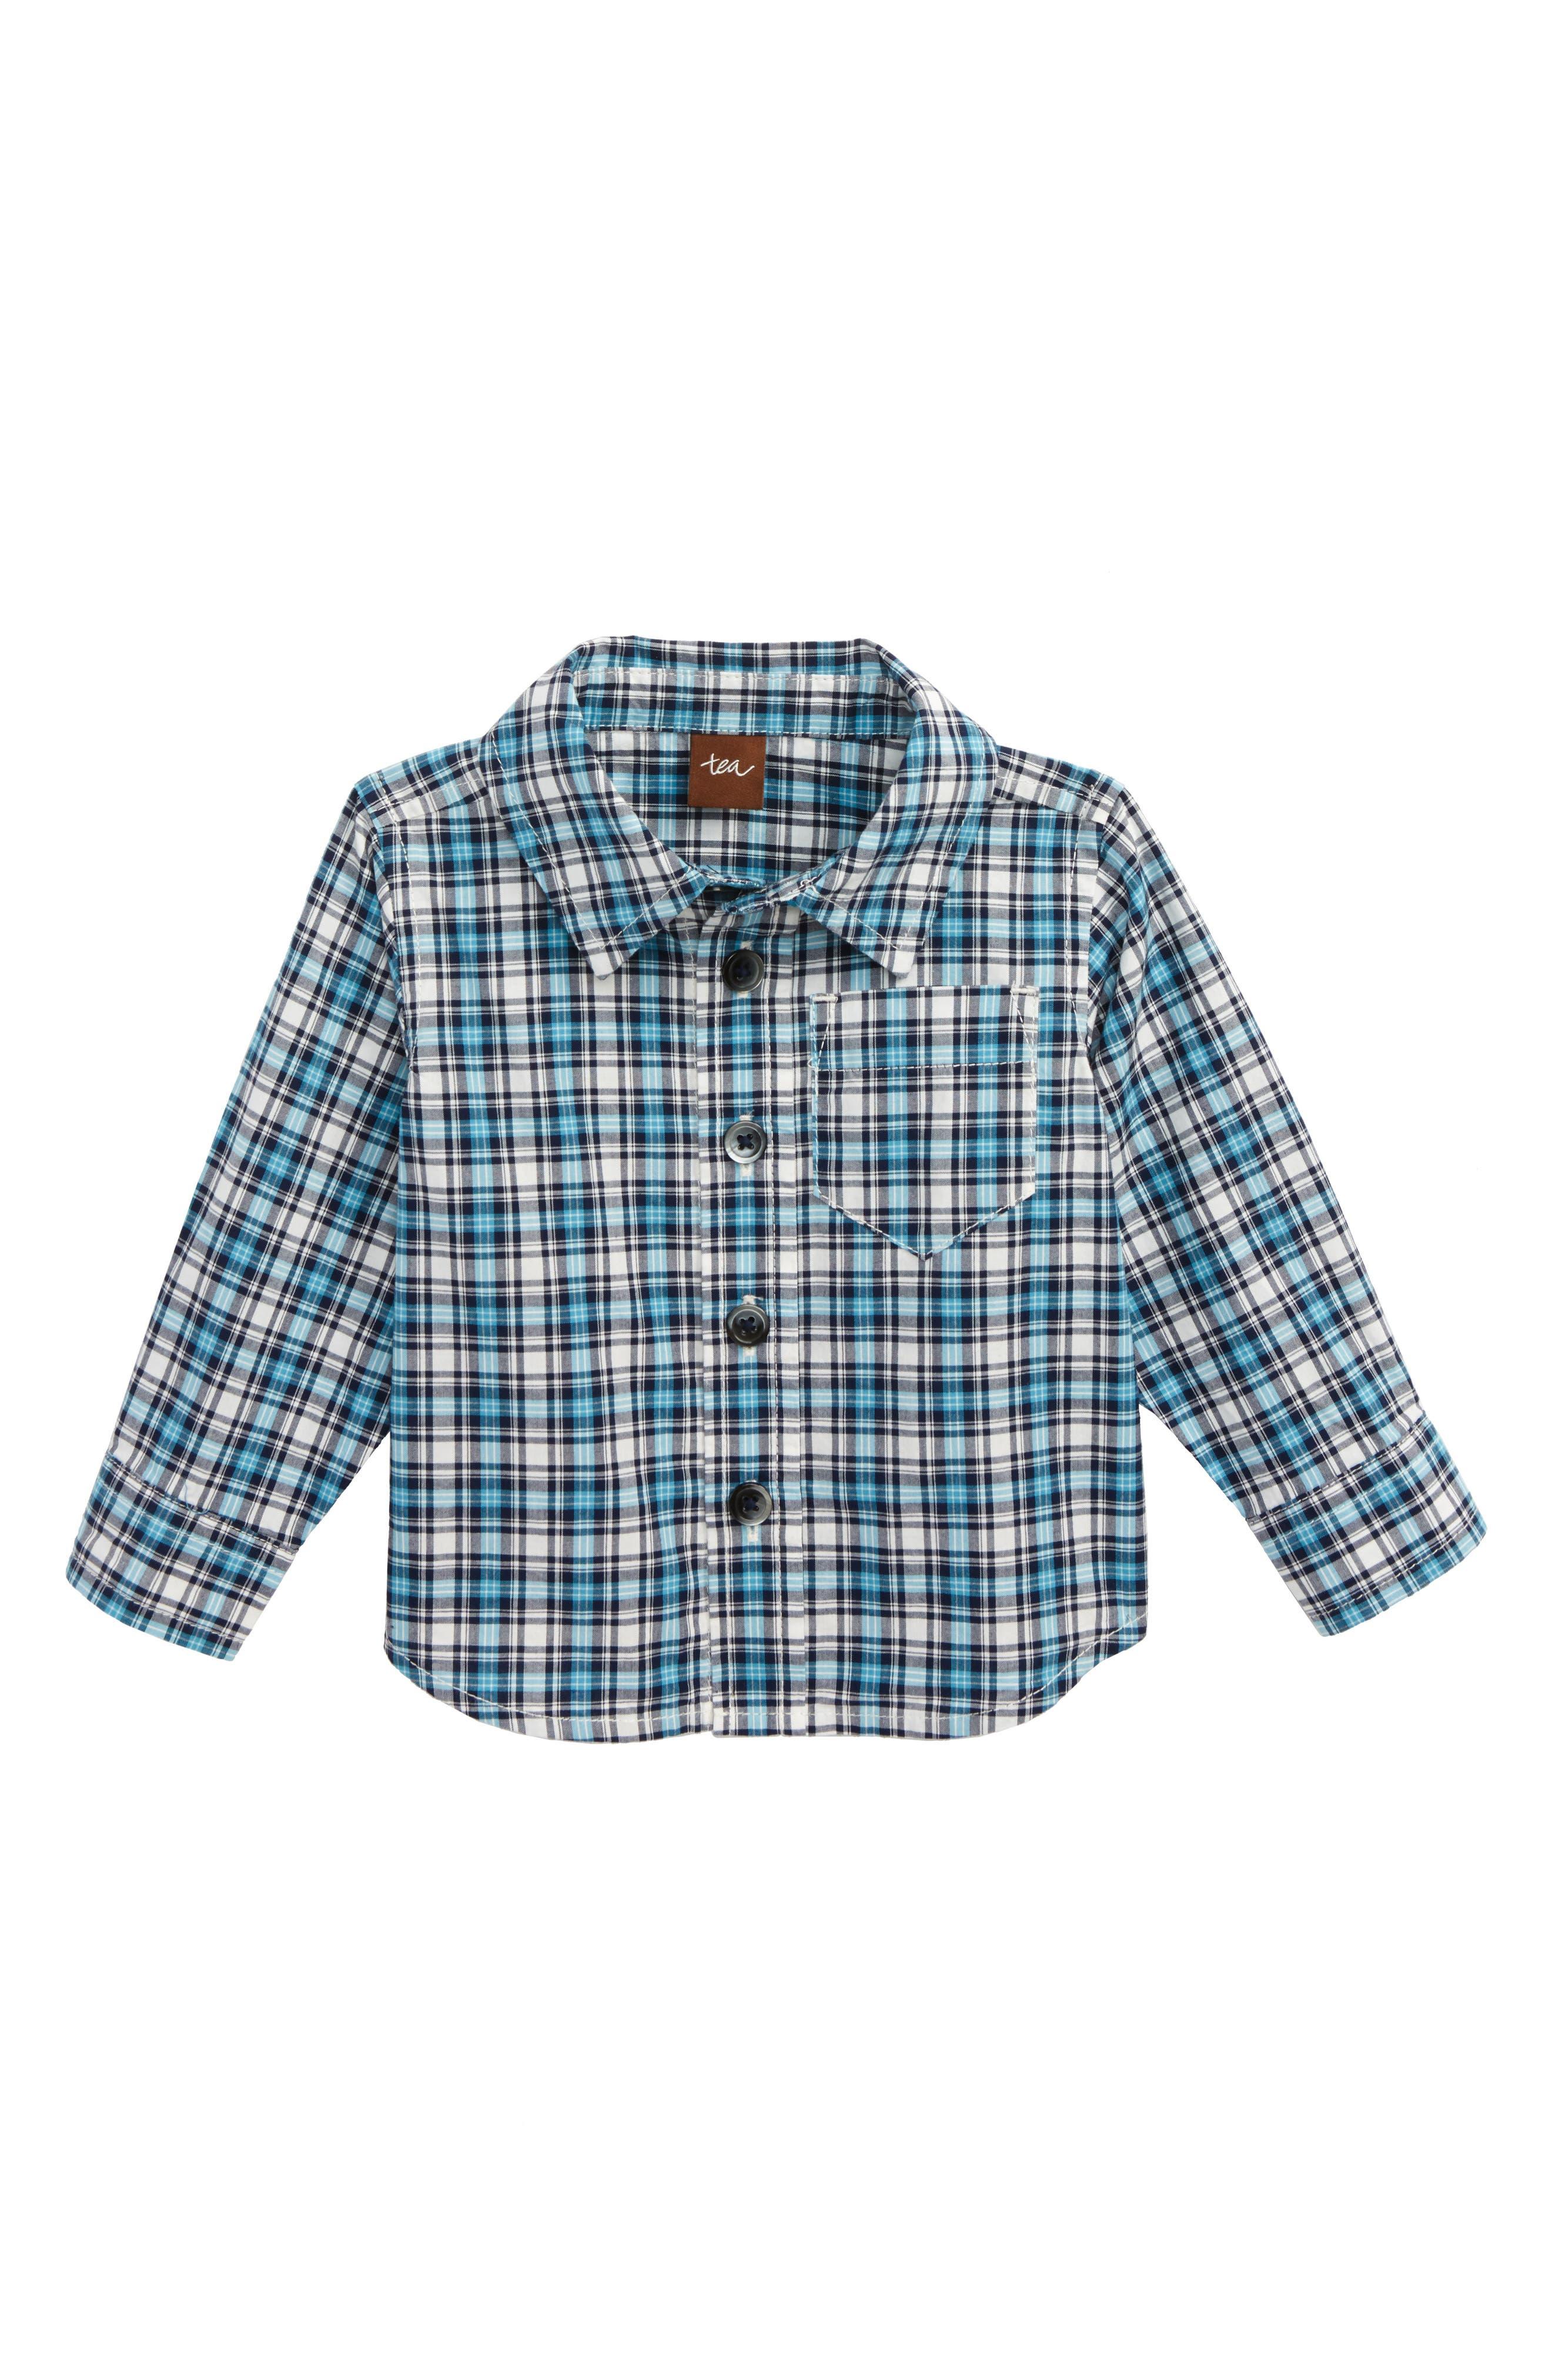 Heath Plaid Woven Shirt,                             Main thumbnail 1, color,